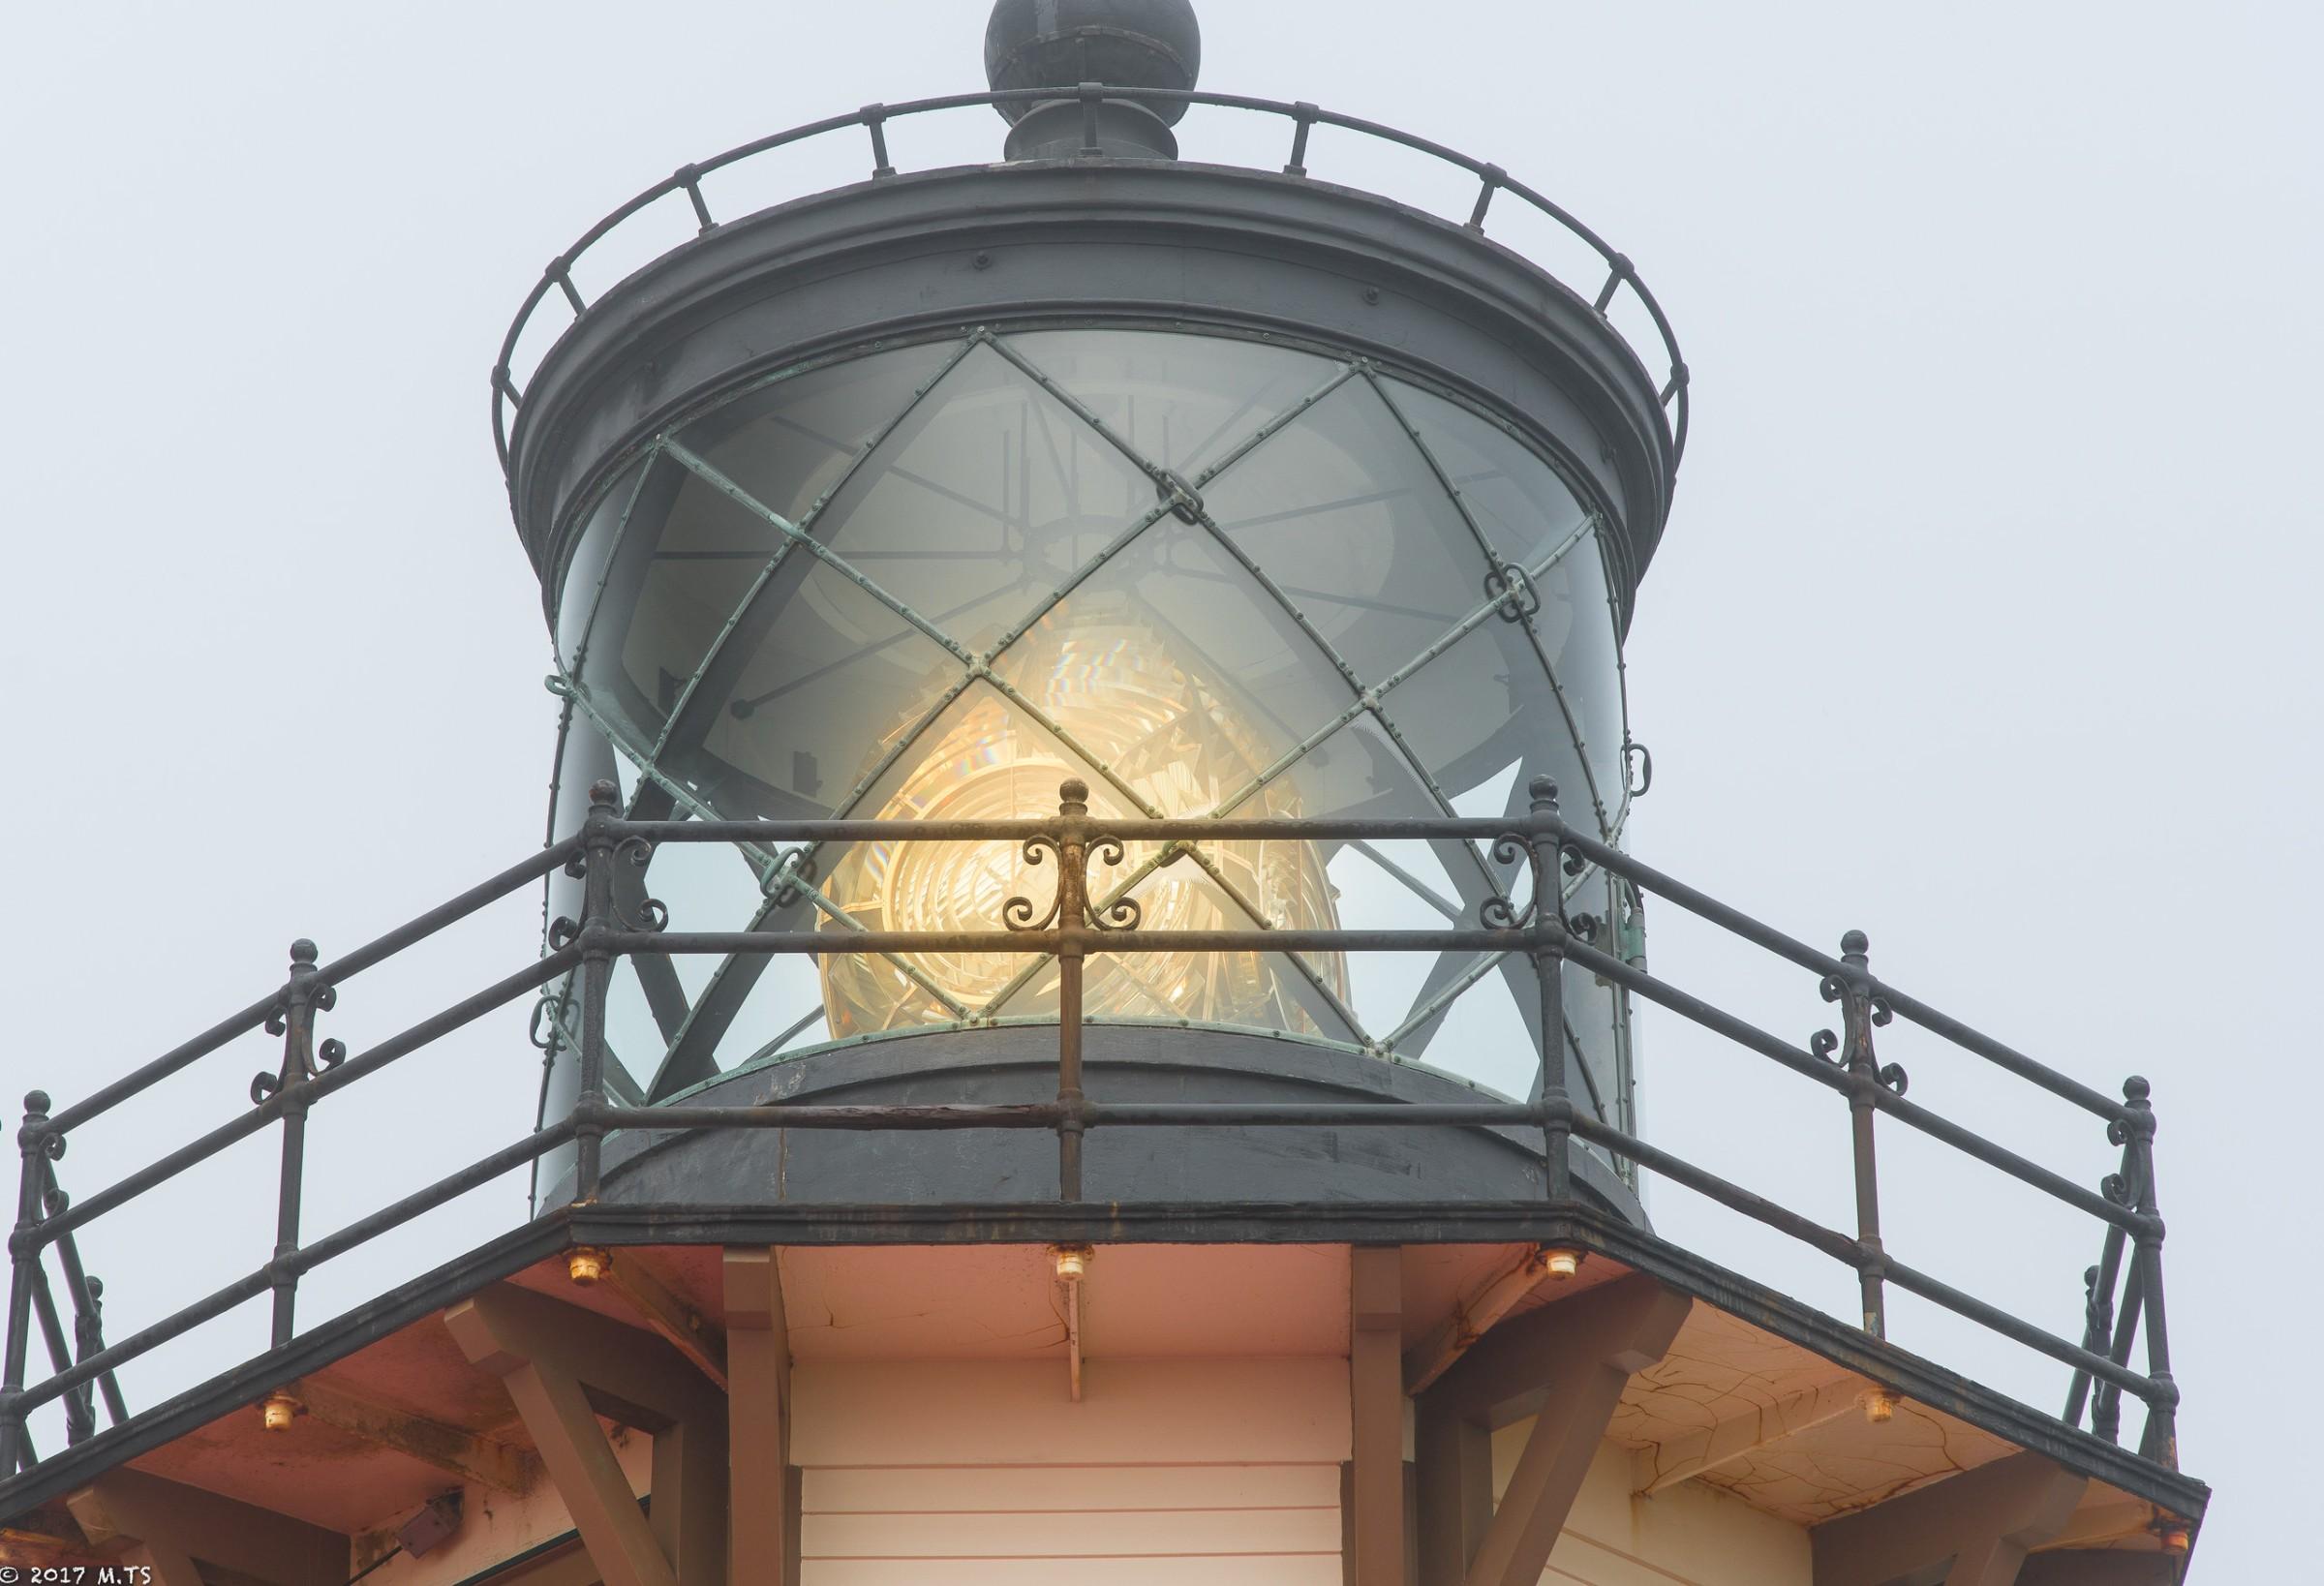 Point Cabrillo Light Station, Mendocino, CA